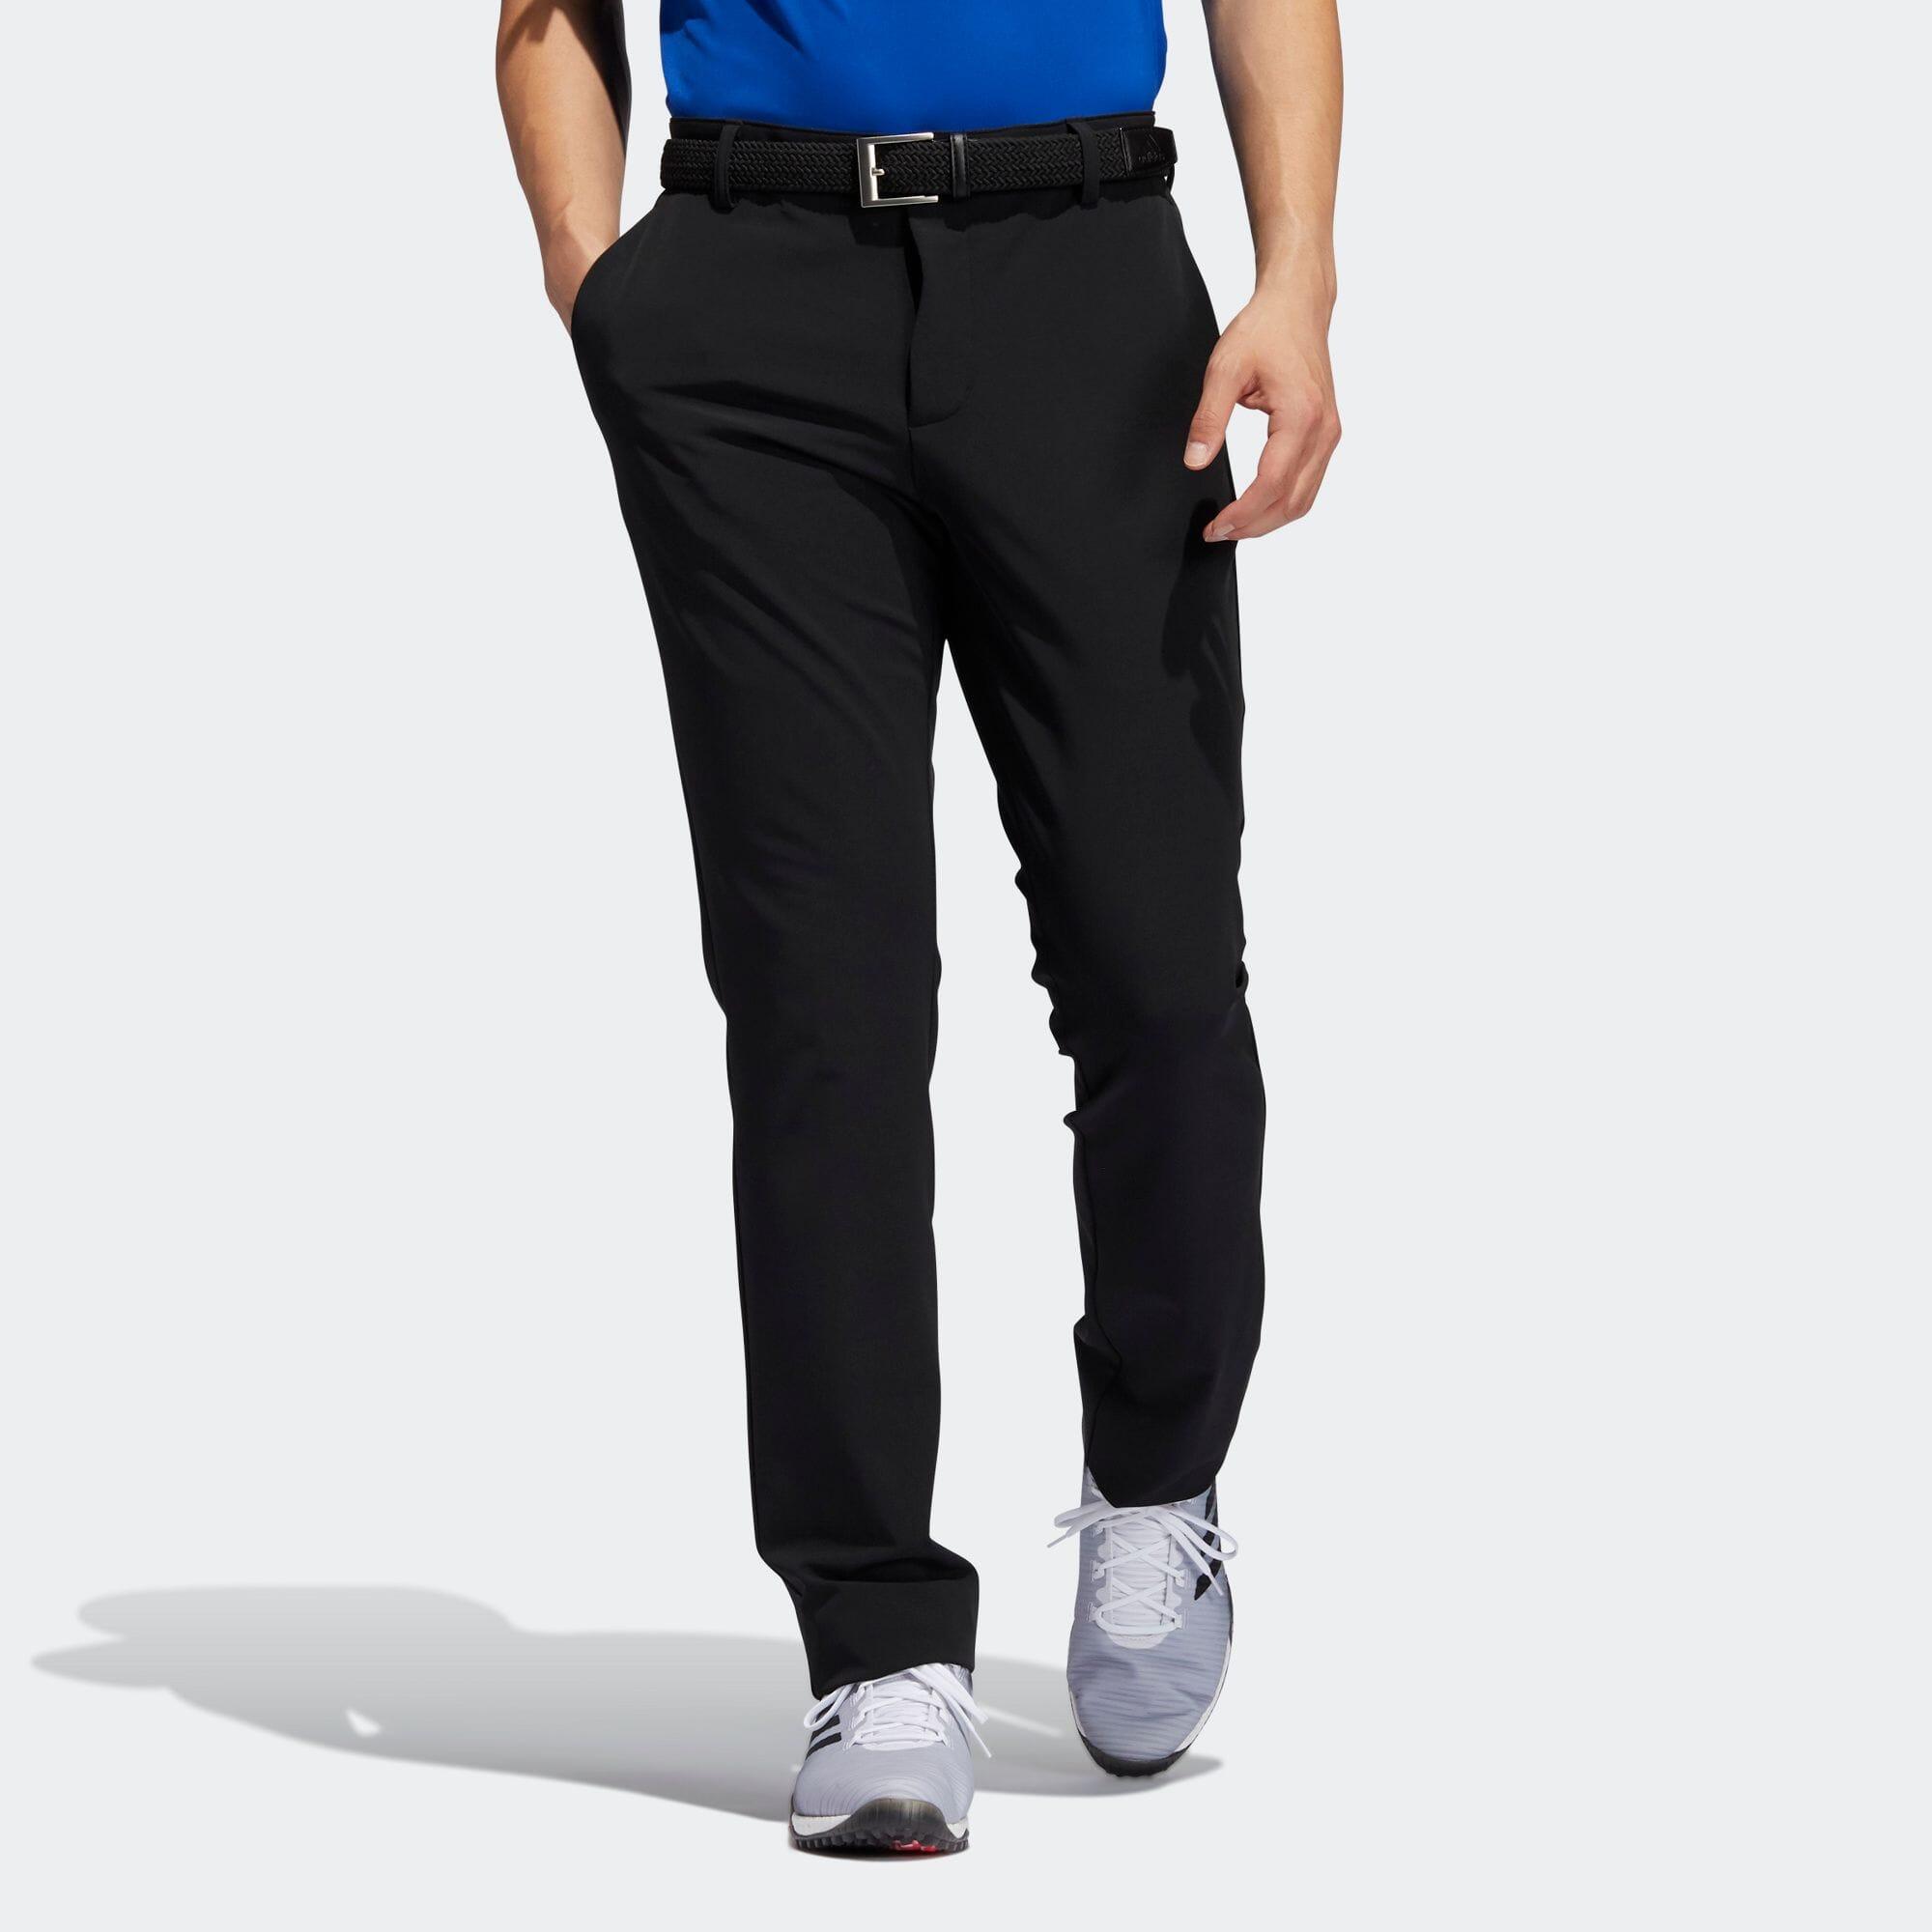 EX STRETCH ACTIVE パンツ 【ゴルフ】 / Four-Way Stretch Pants